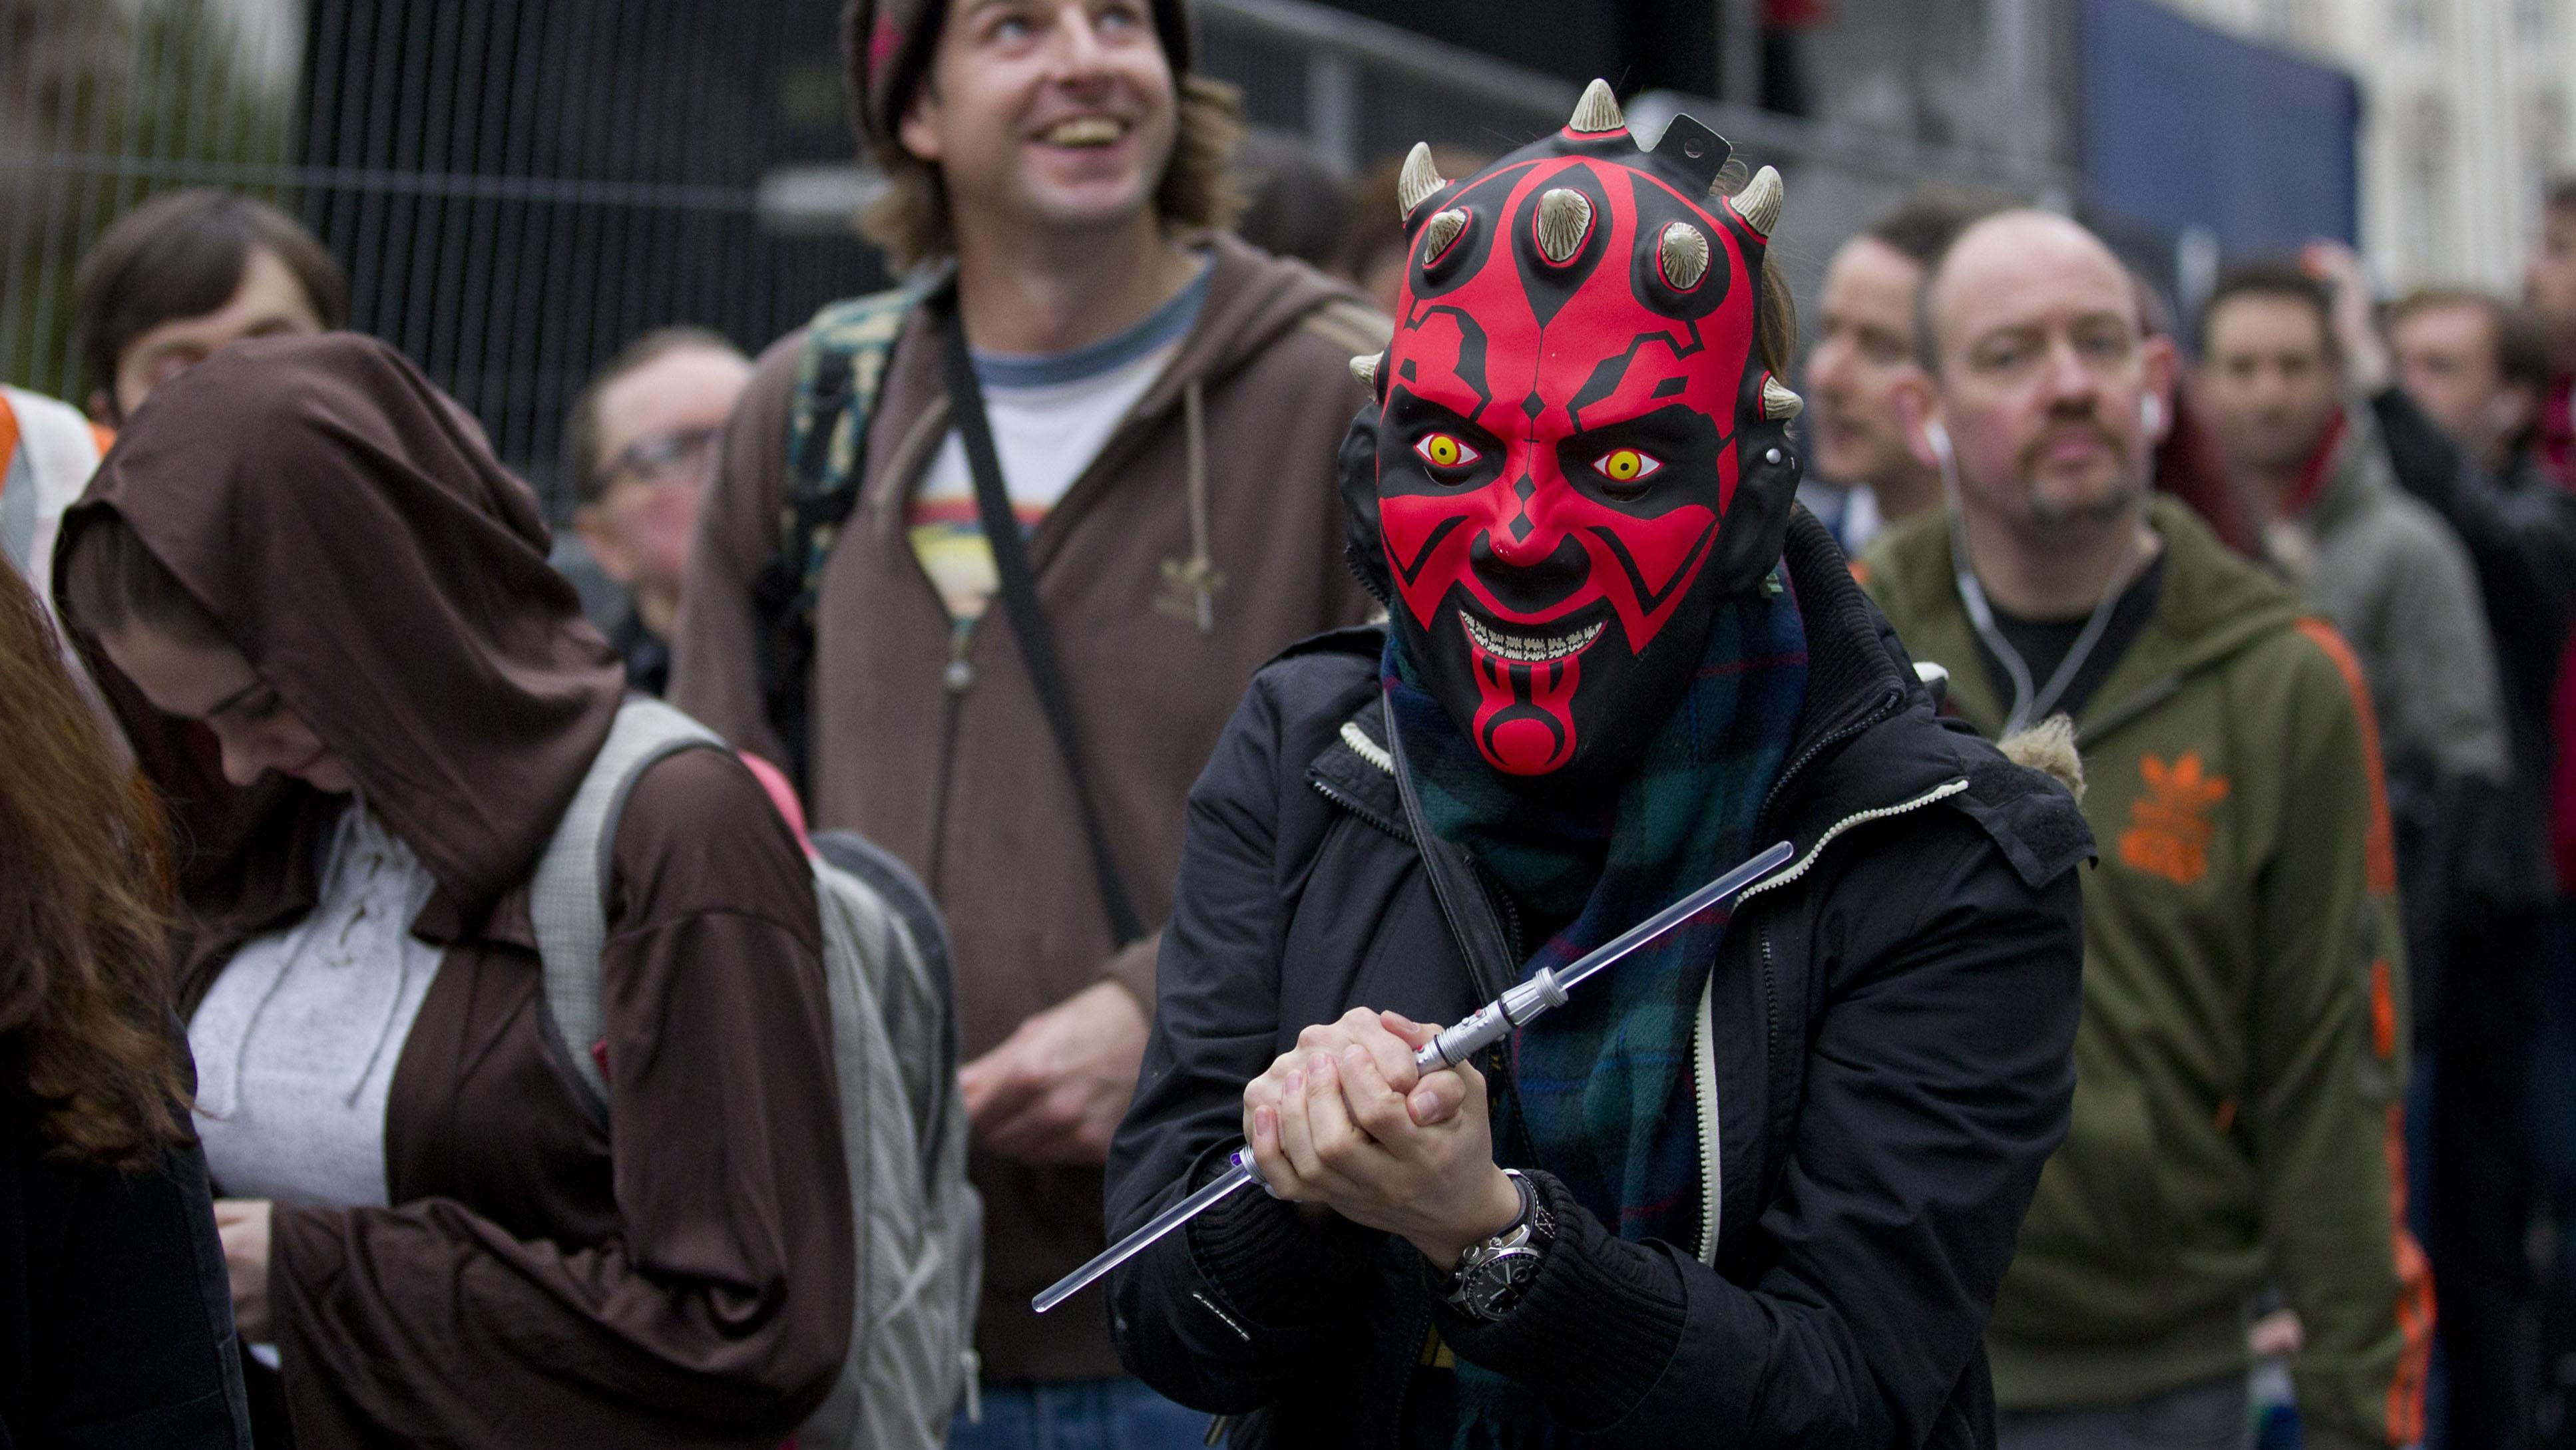 Star Wars Costumes - H 2015